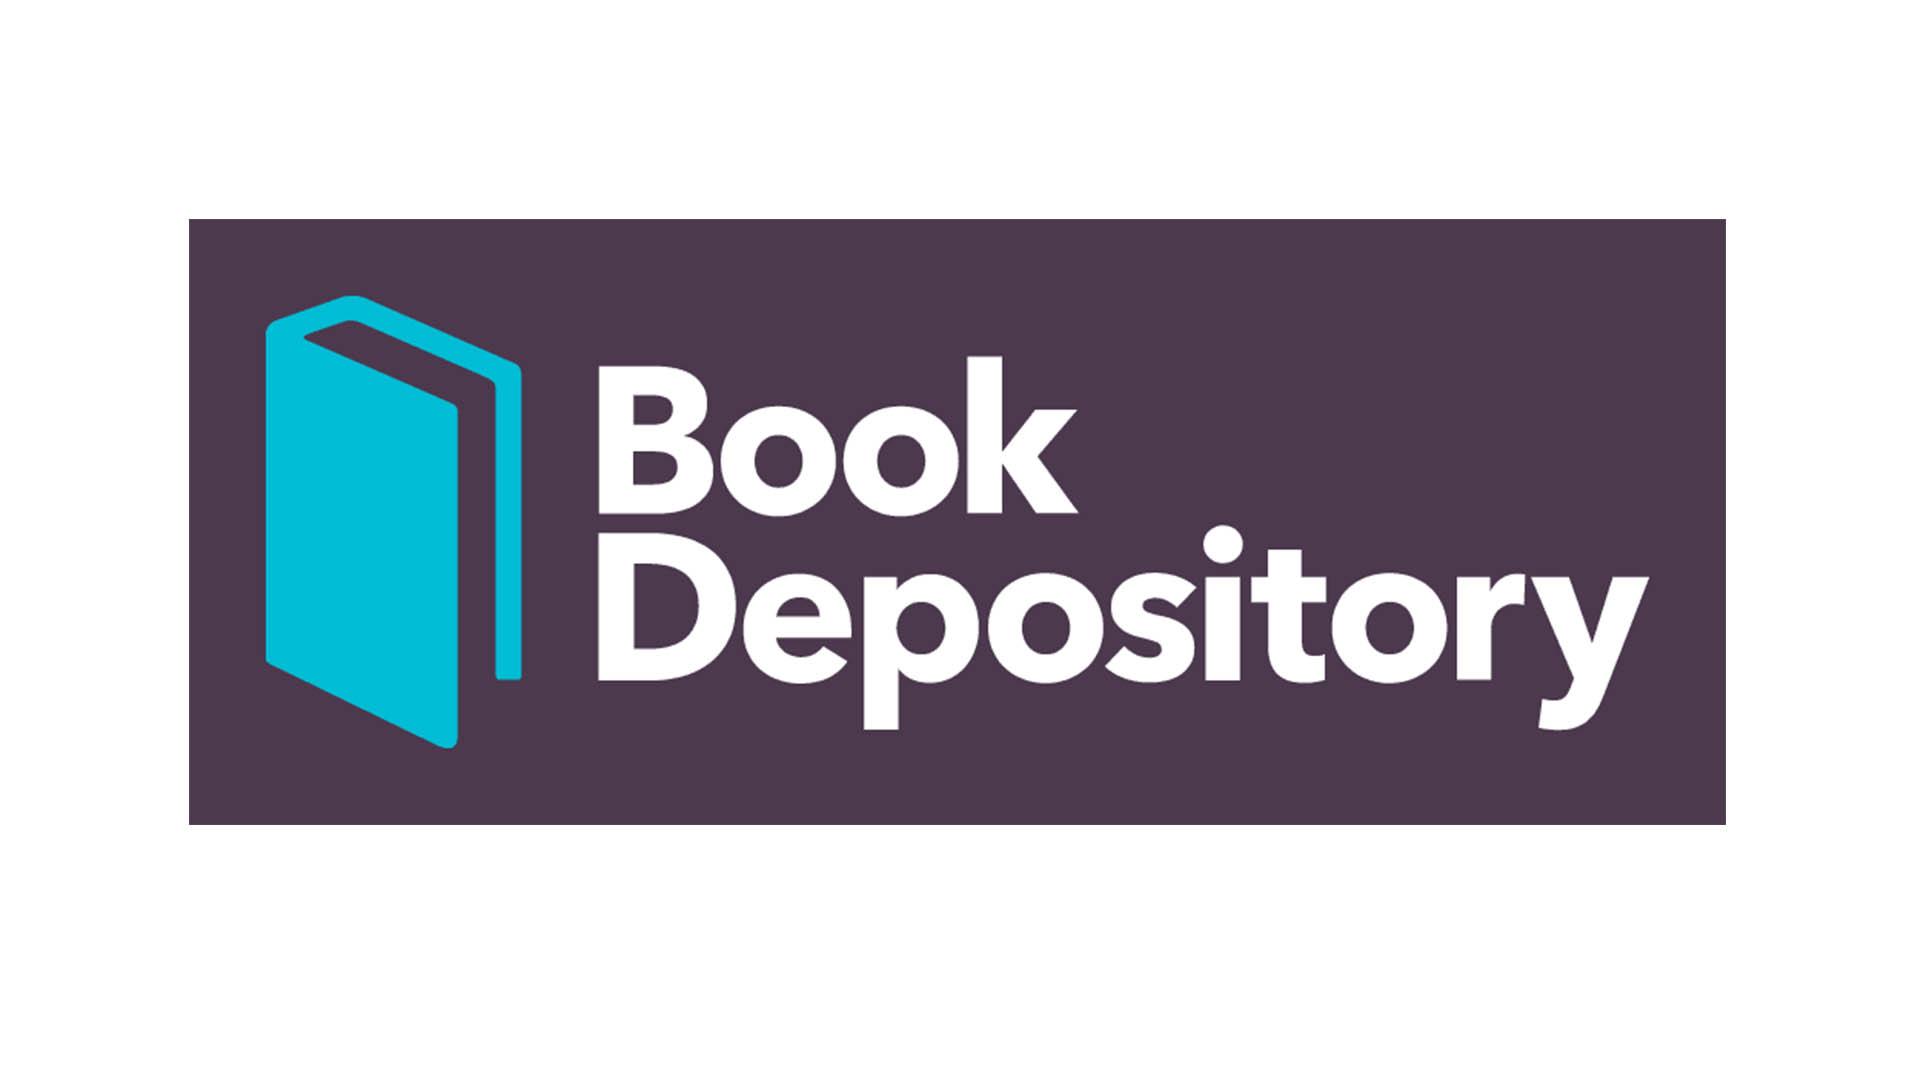 BUY AT BOOK DEPOSITORY (USA)